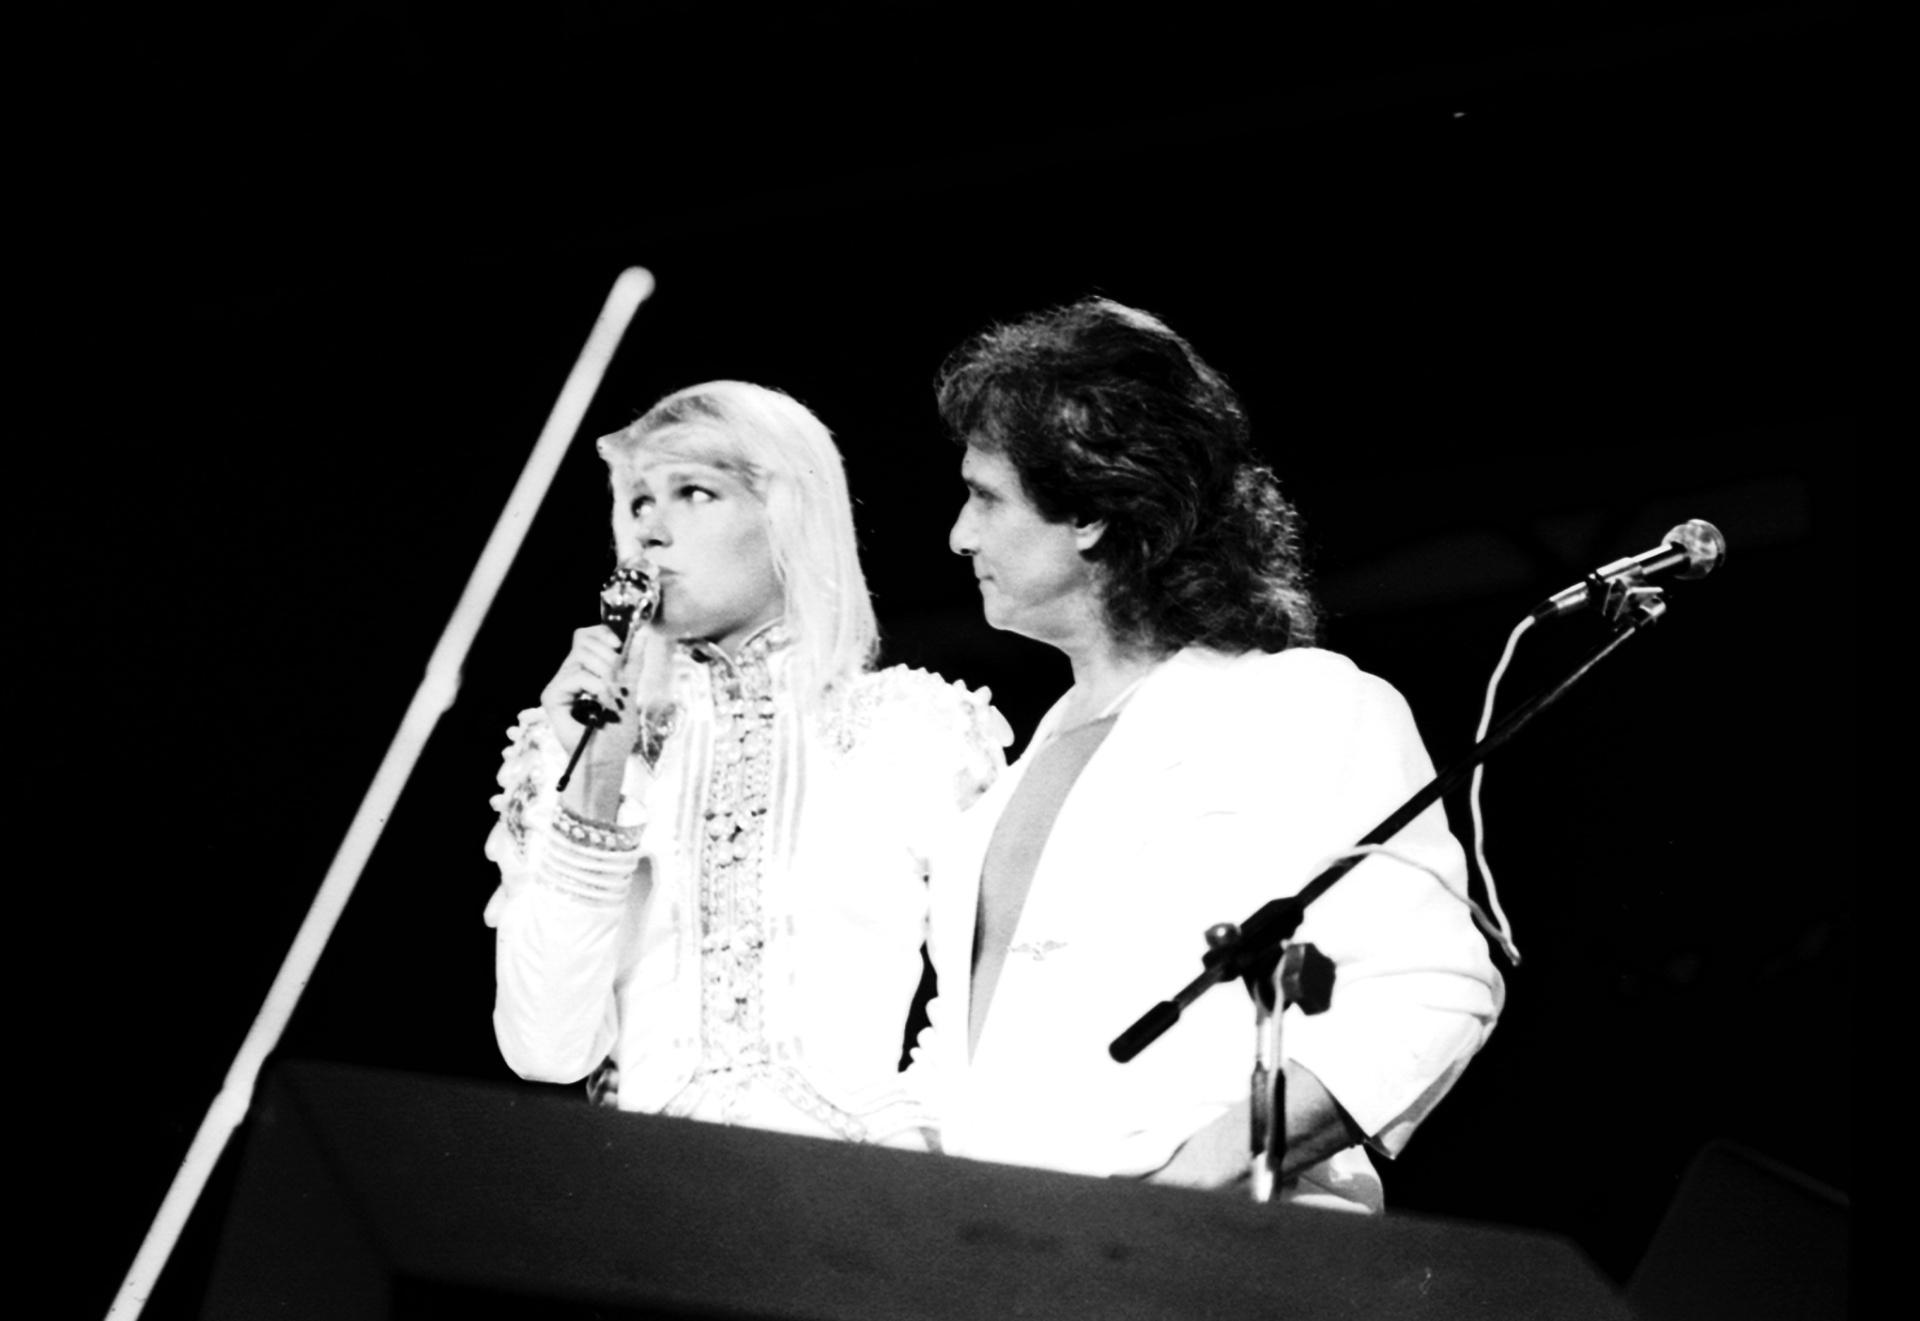 Roberto Carlos canta com a apresentadora Xuxa no especial de1990